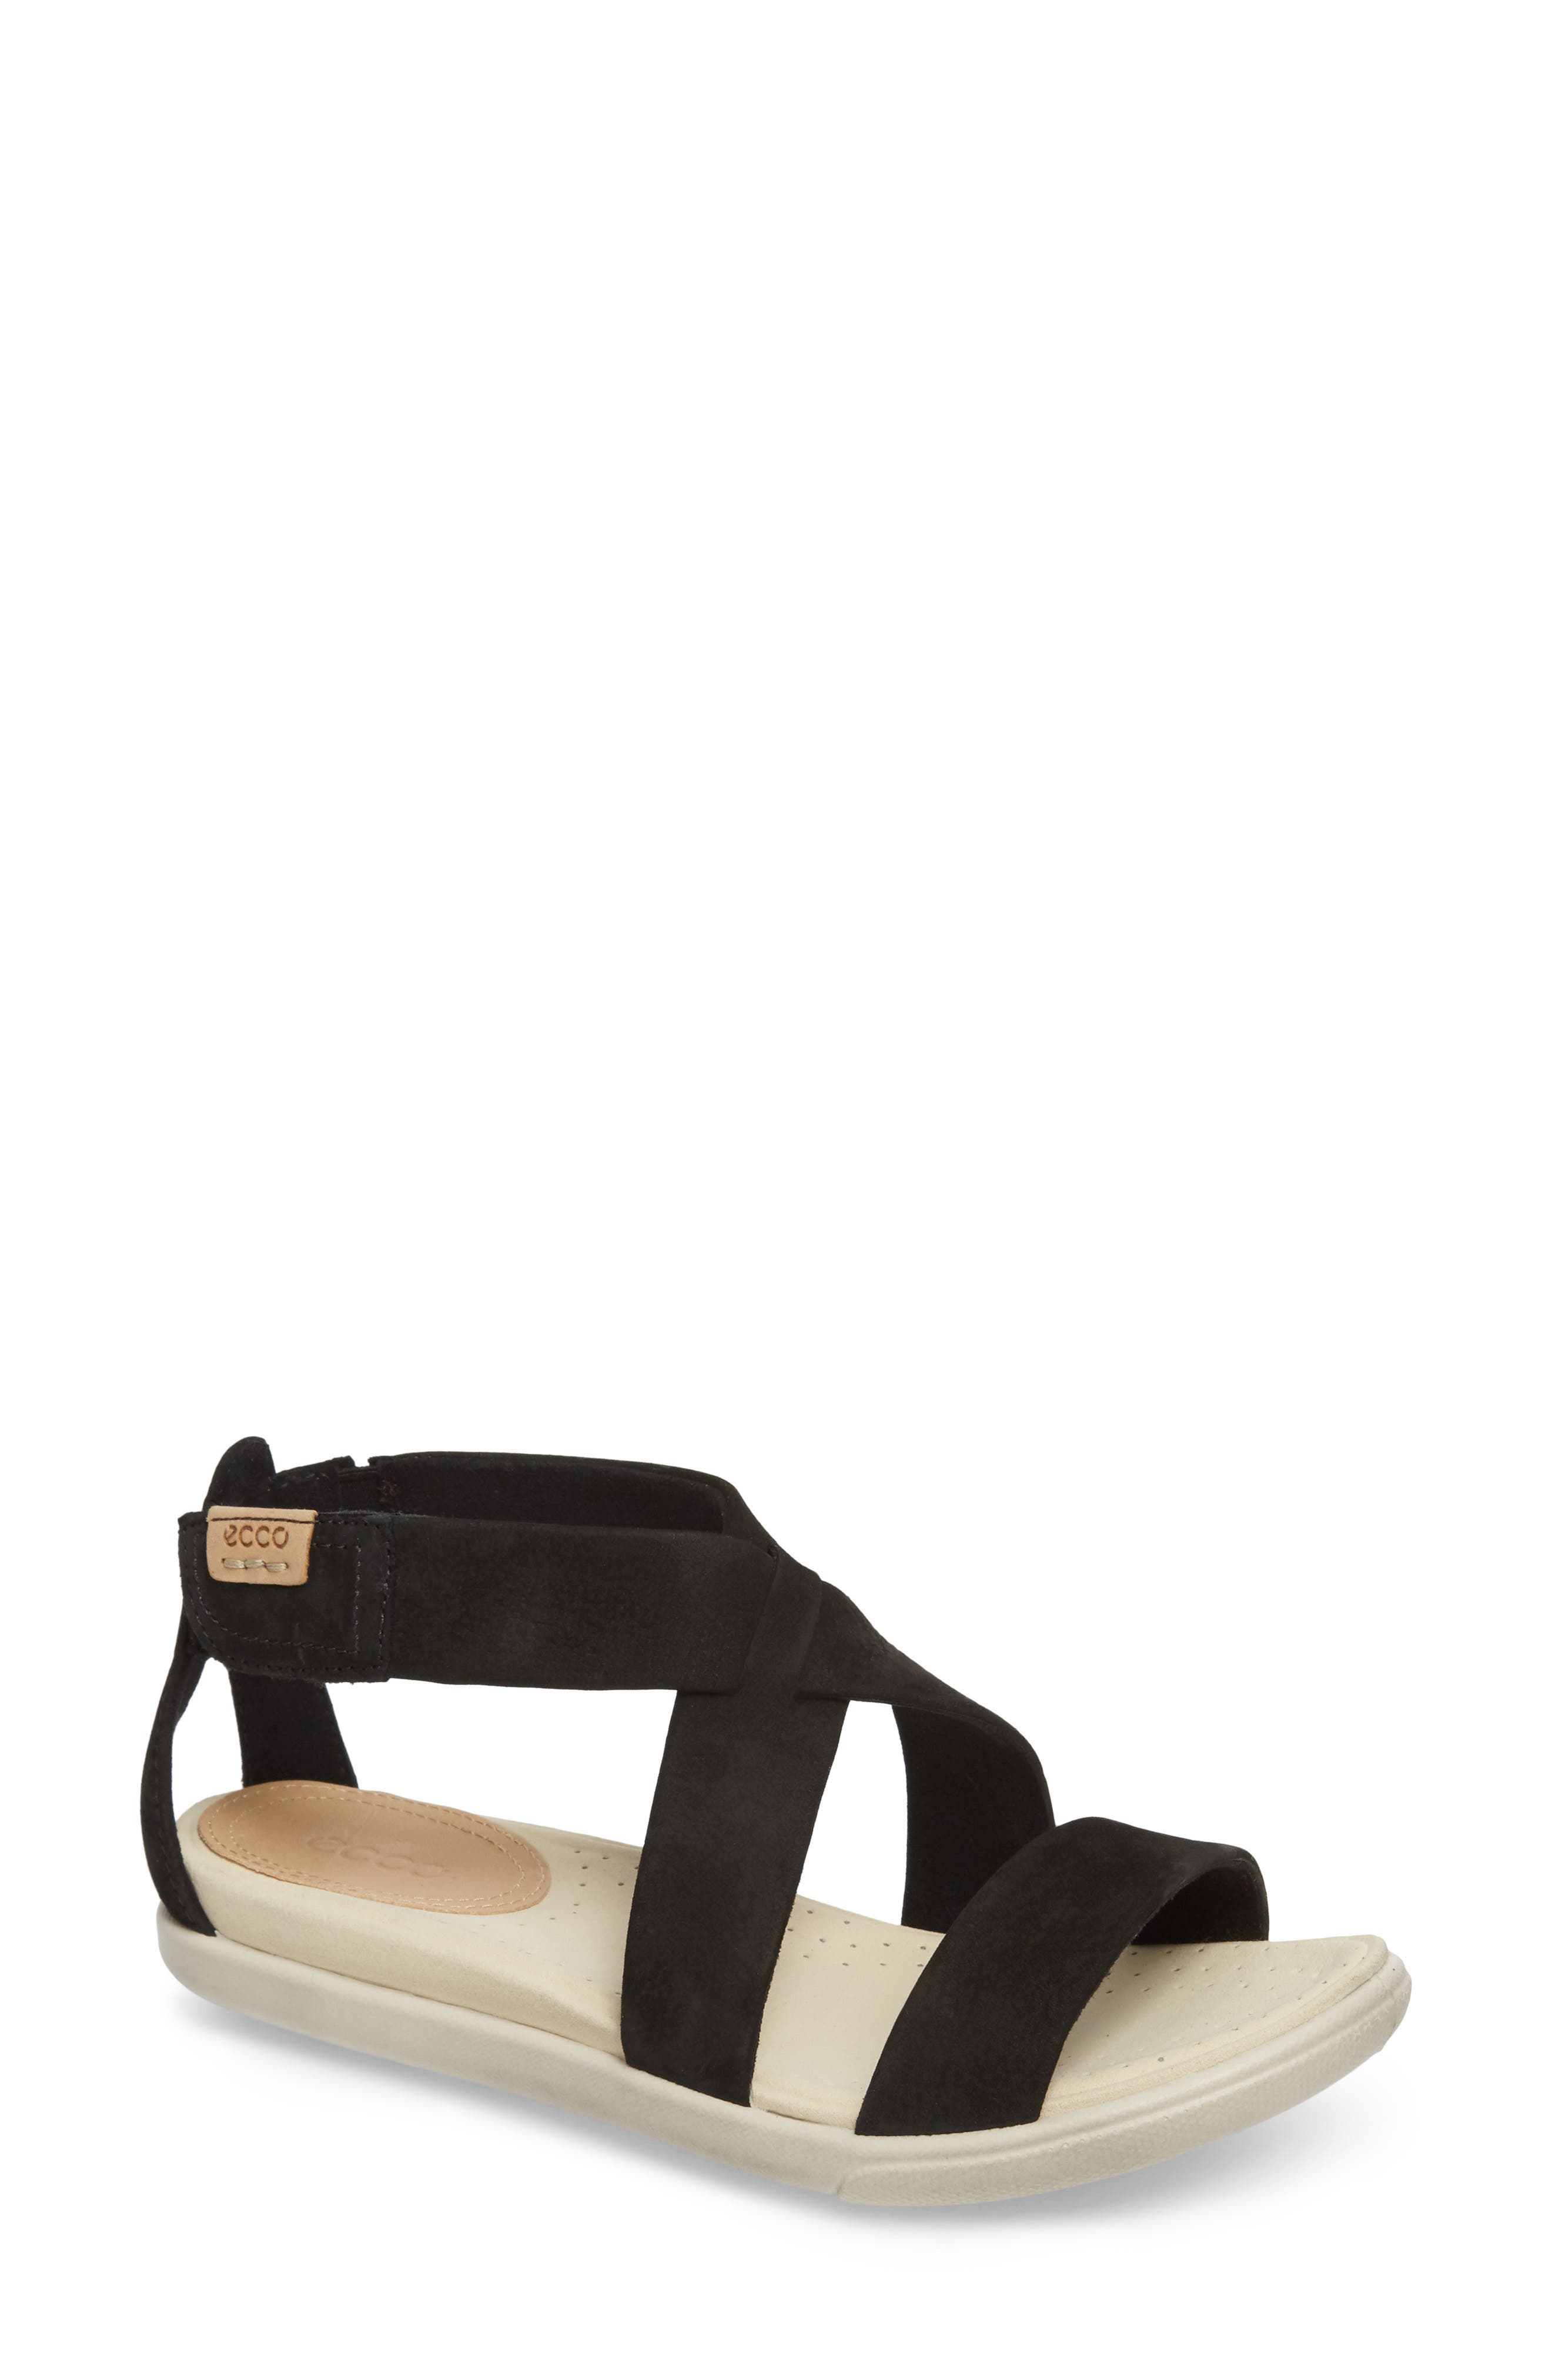 Damara Sandal,                         Main,                         color, BLACK